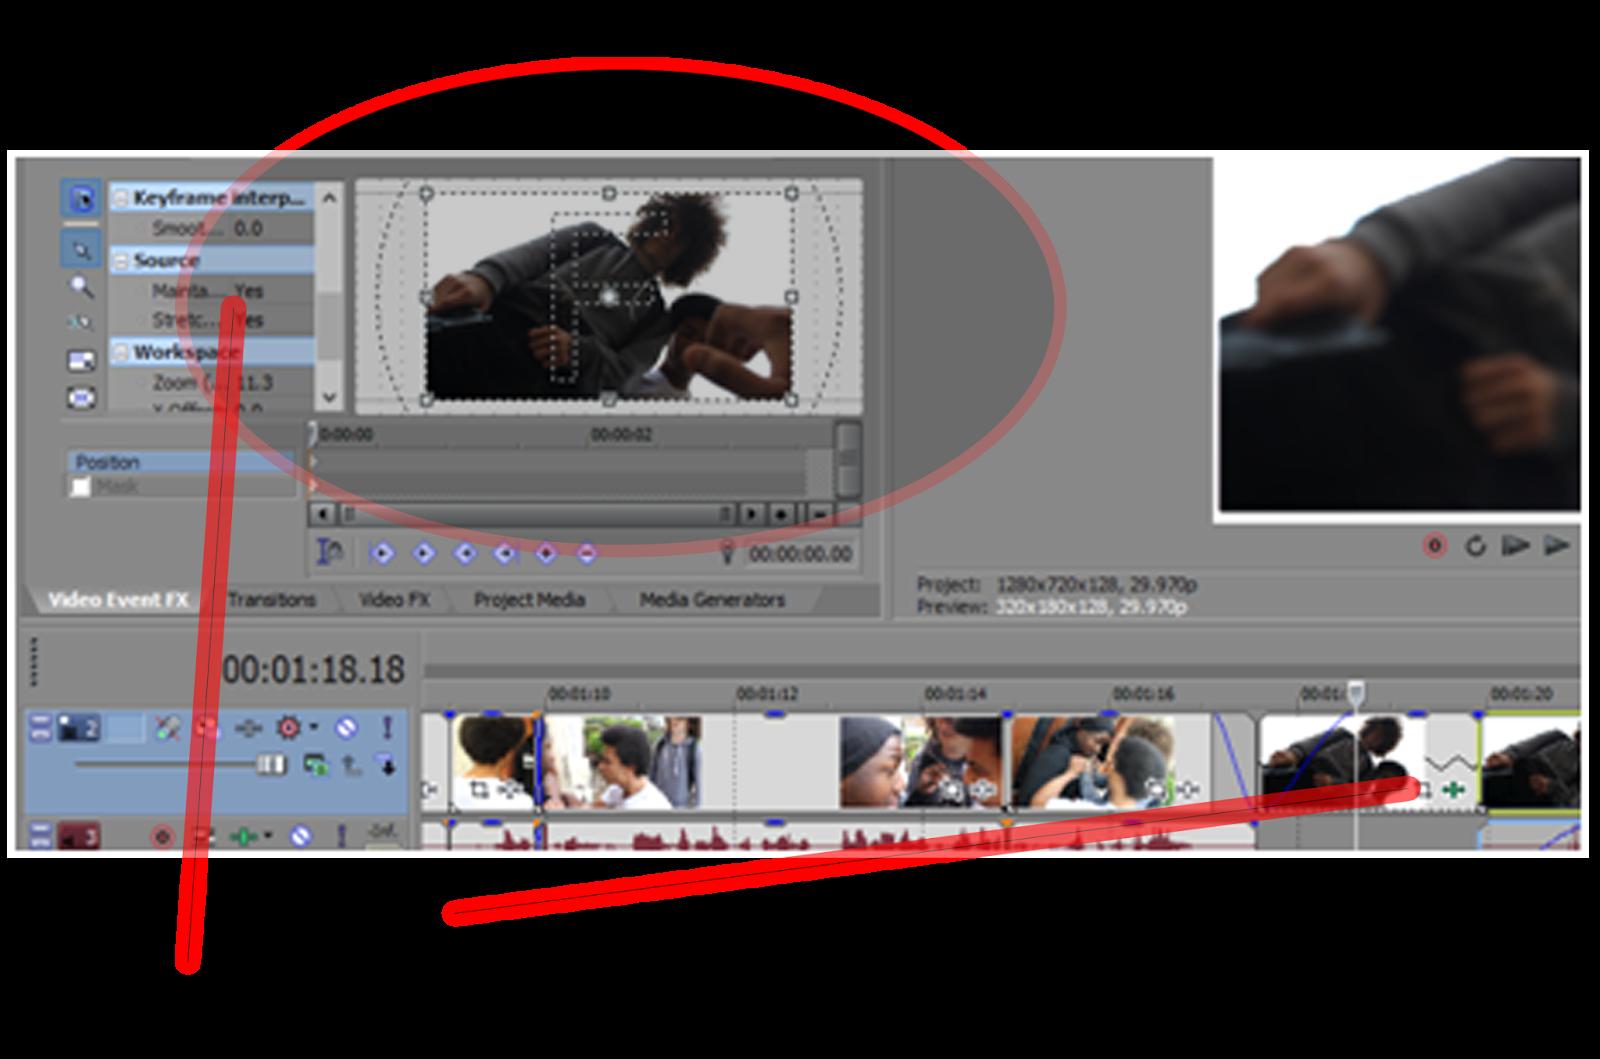 clip art download As Media Studies